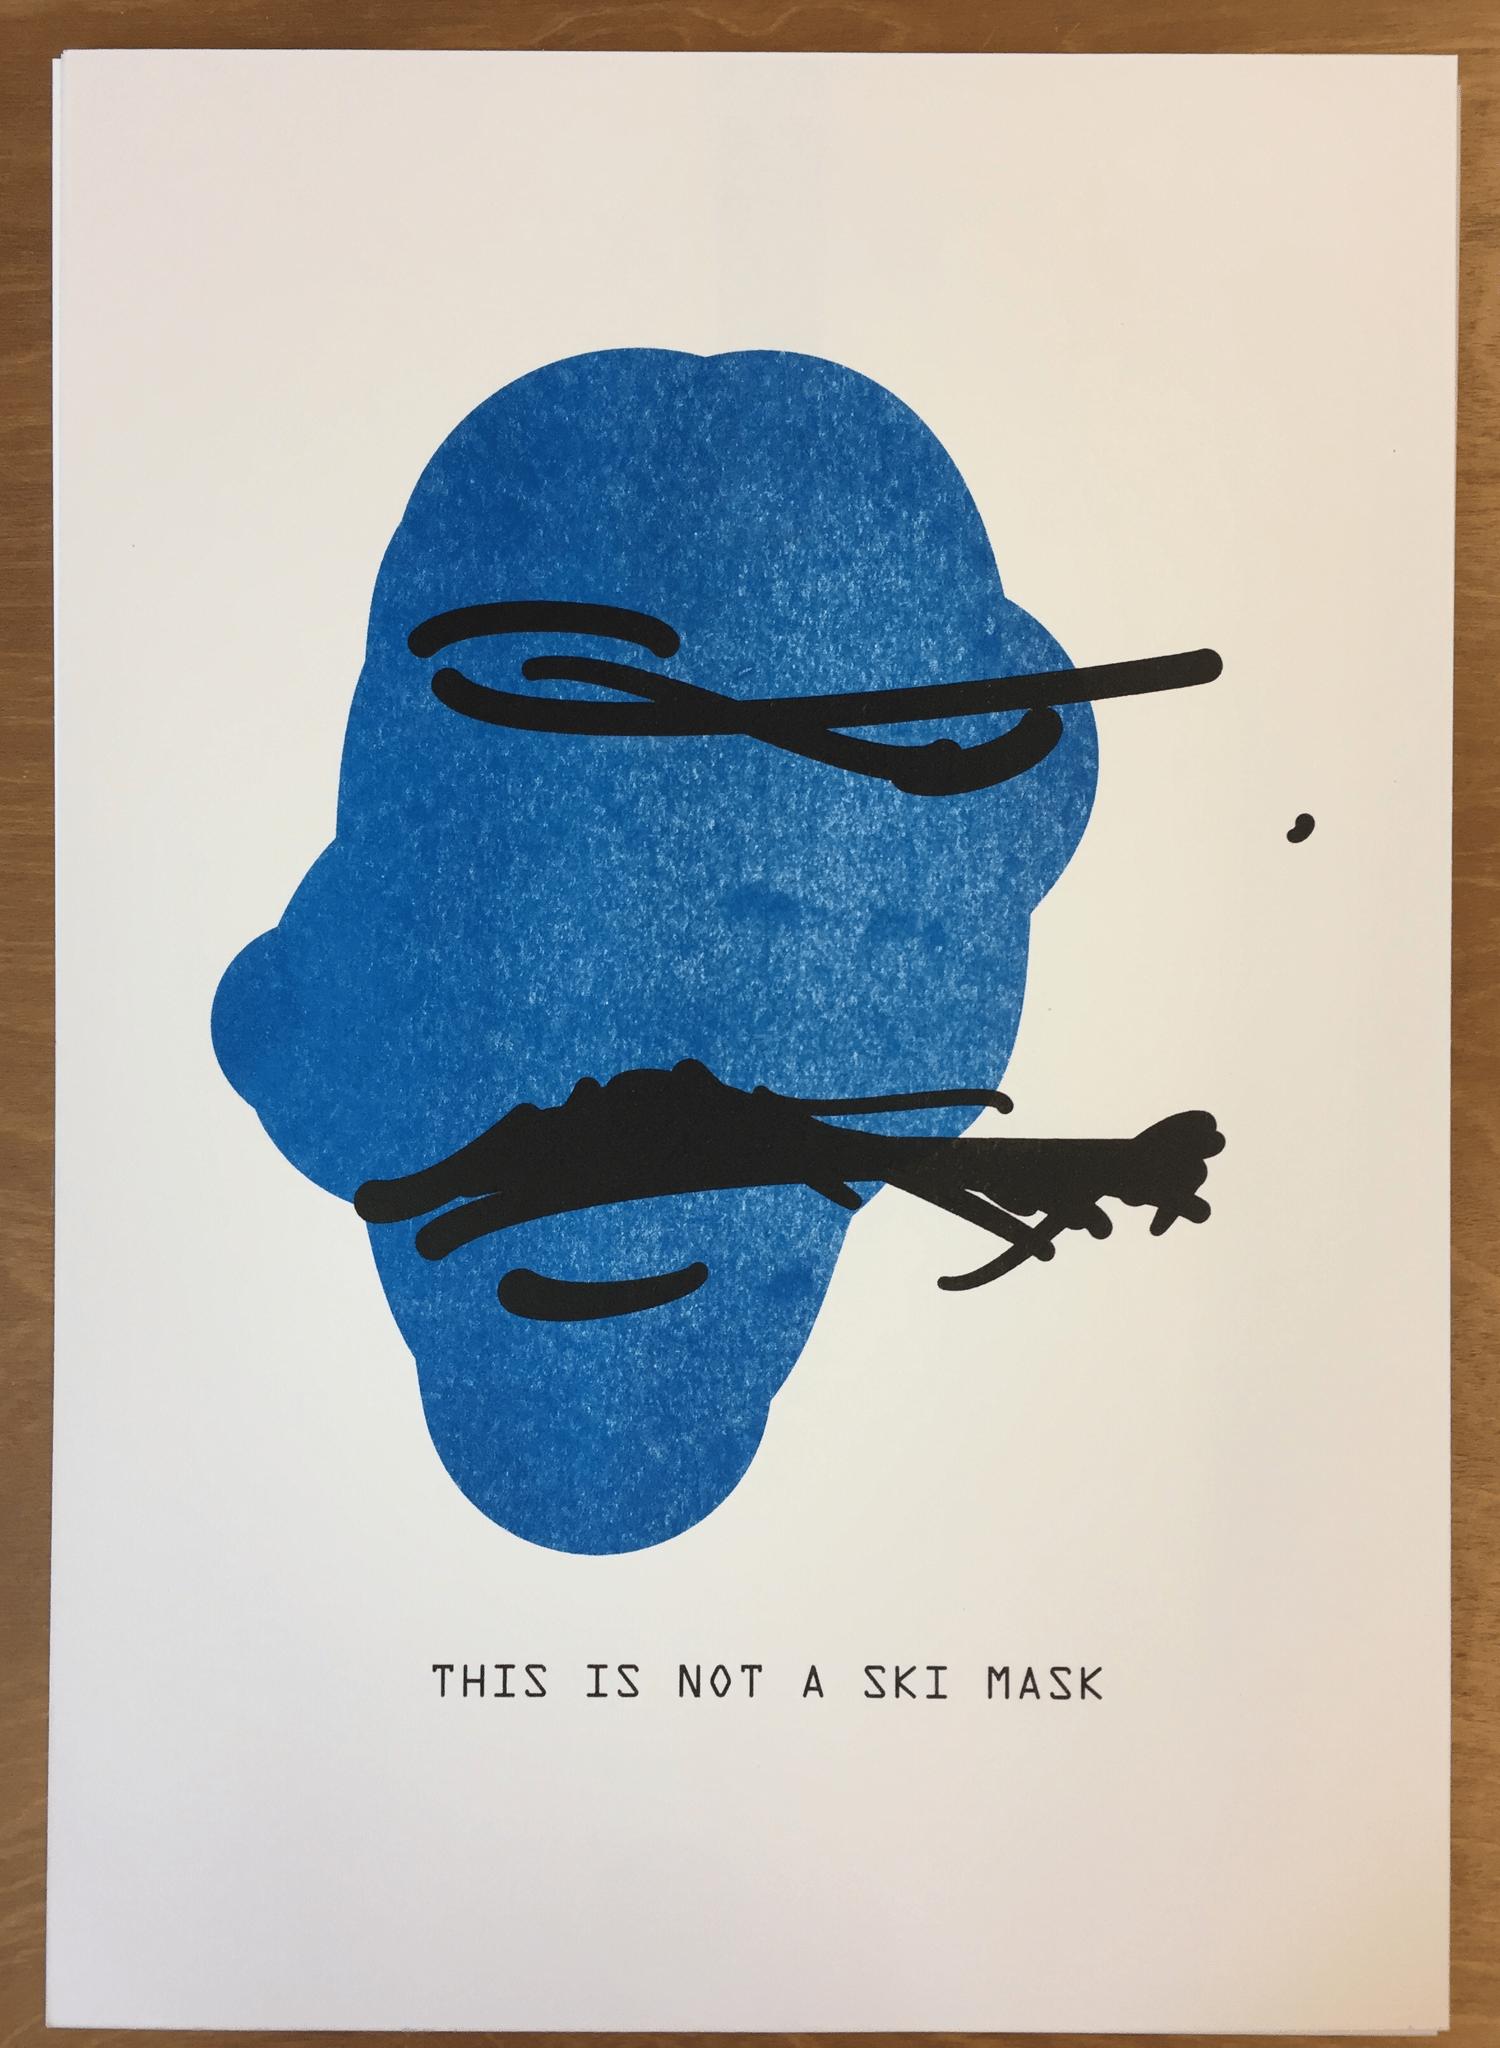 Image of The Treachery of ImageNet: Ski Mask